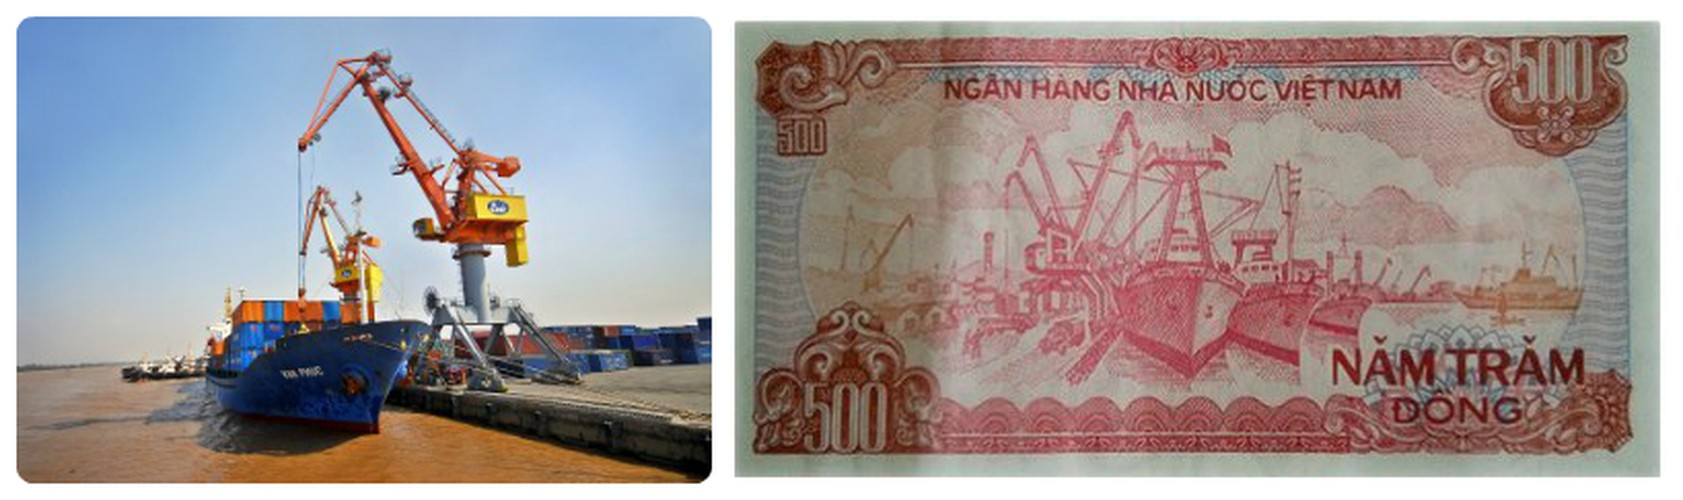 Giai ma tat tat dia danh in tren tien Viet Nam-Hinh-2